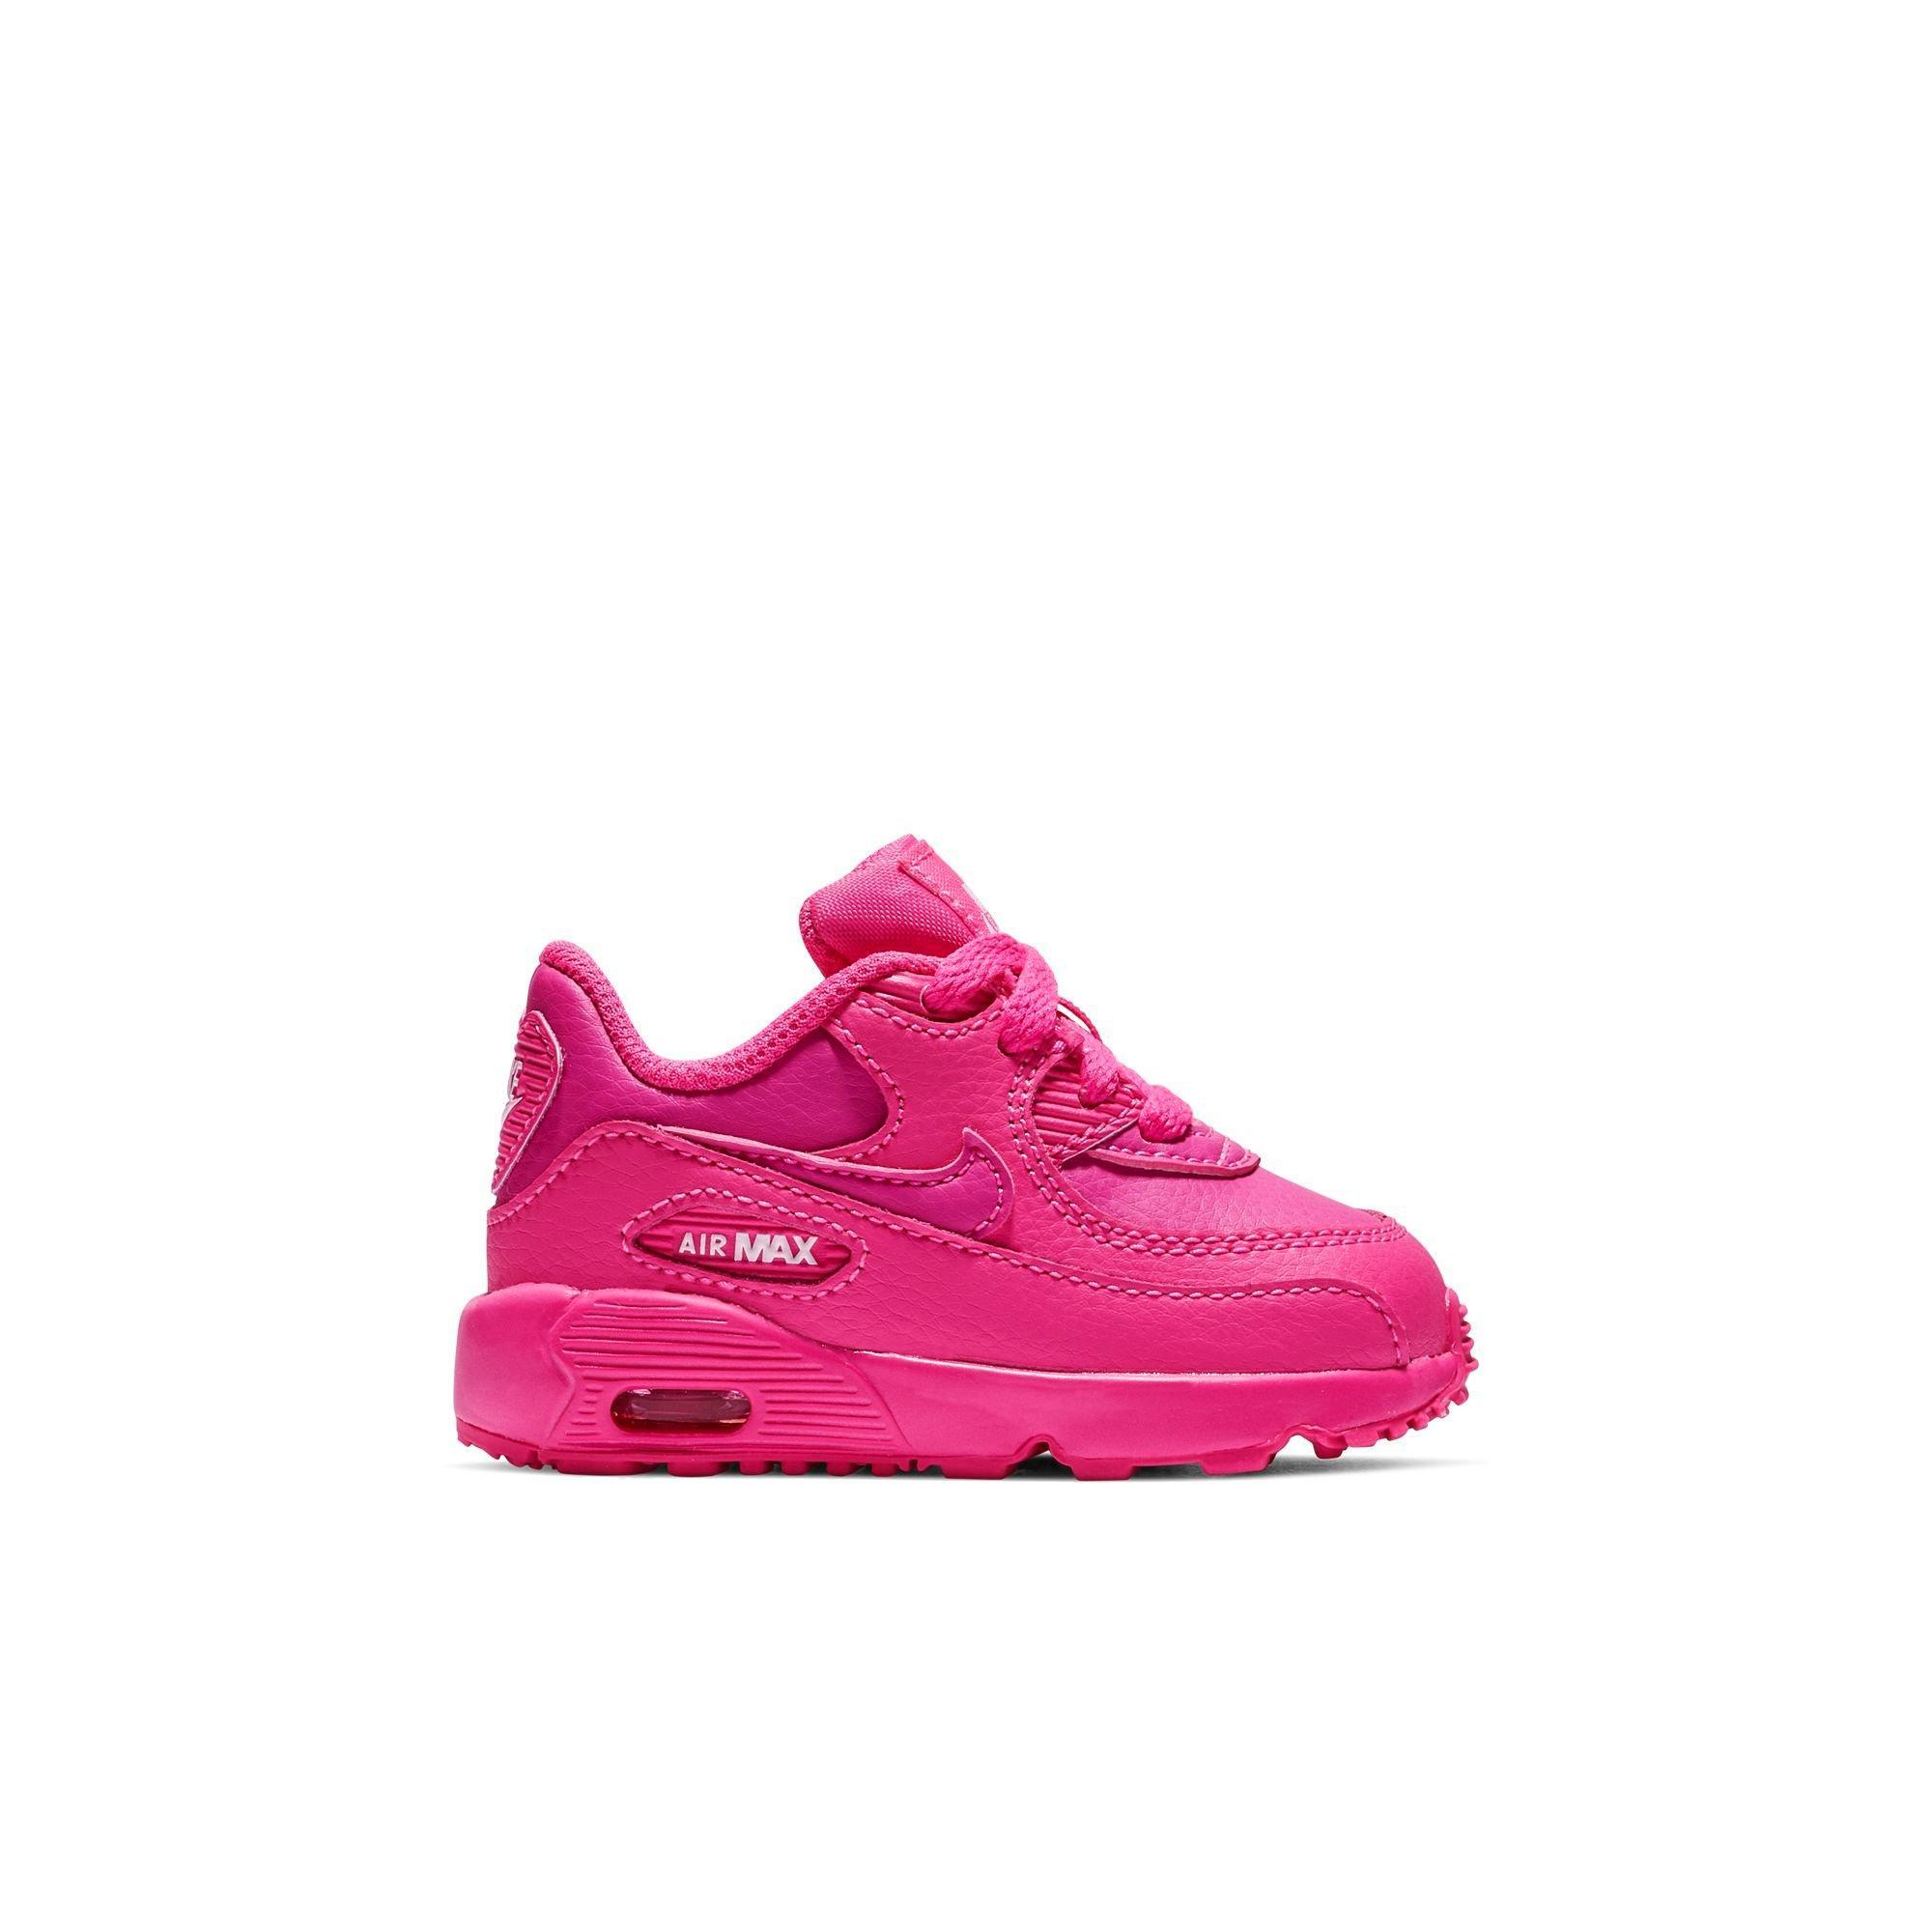 toddler girl nike air max shoes